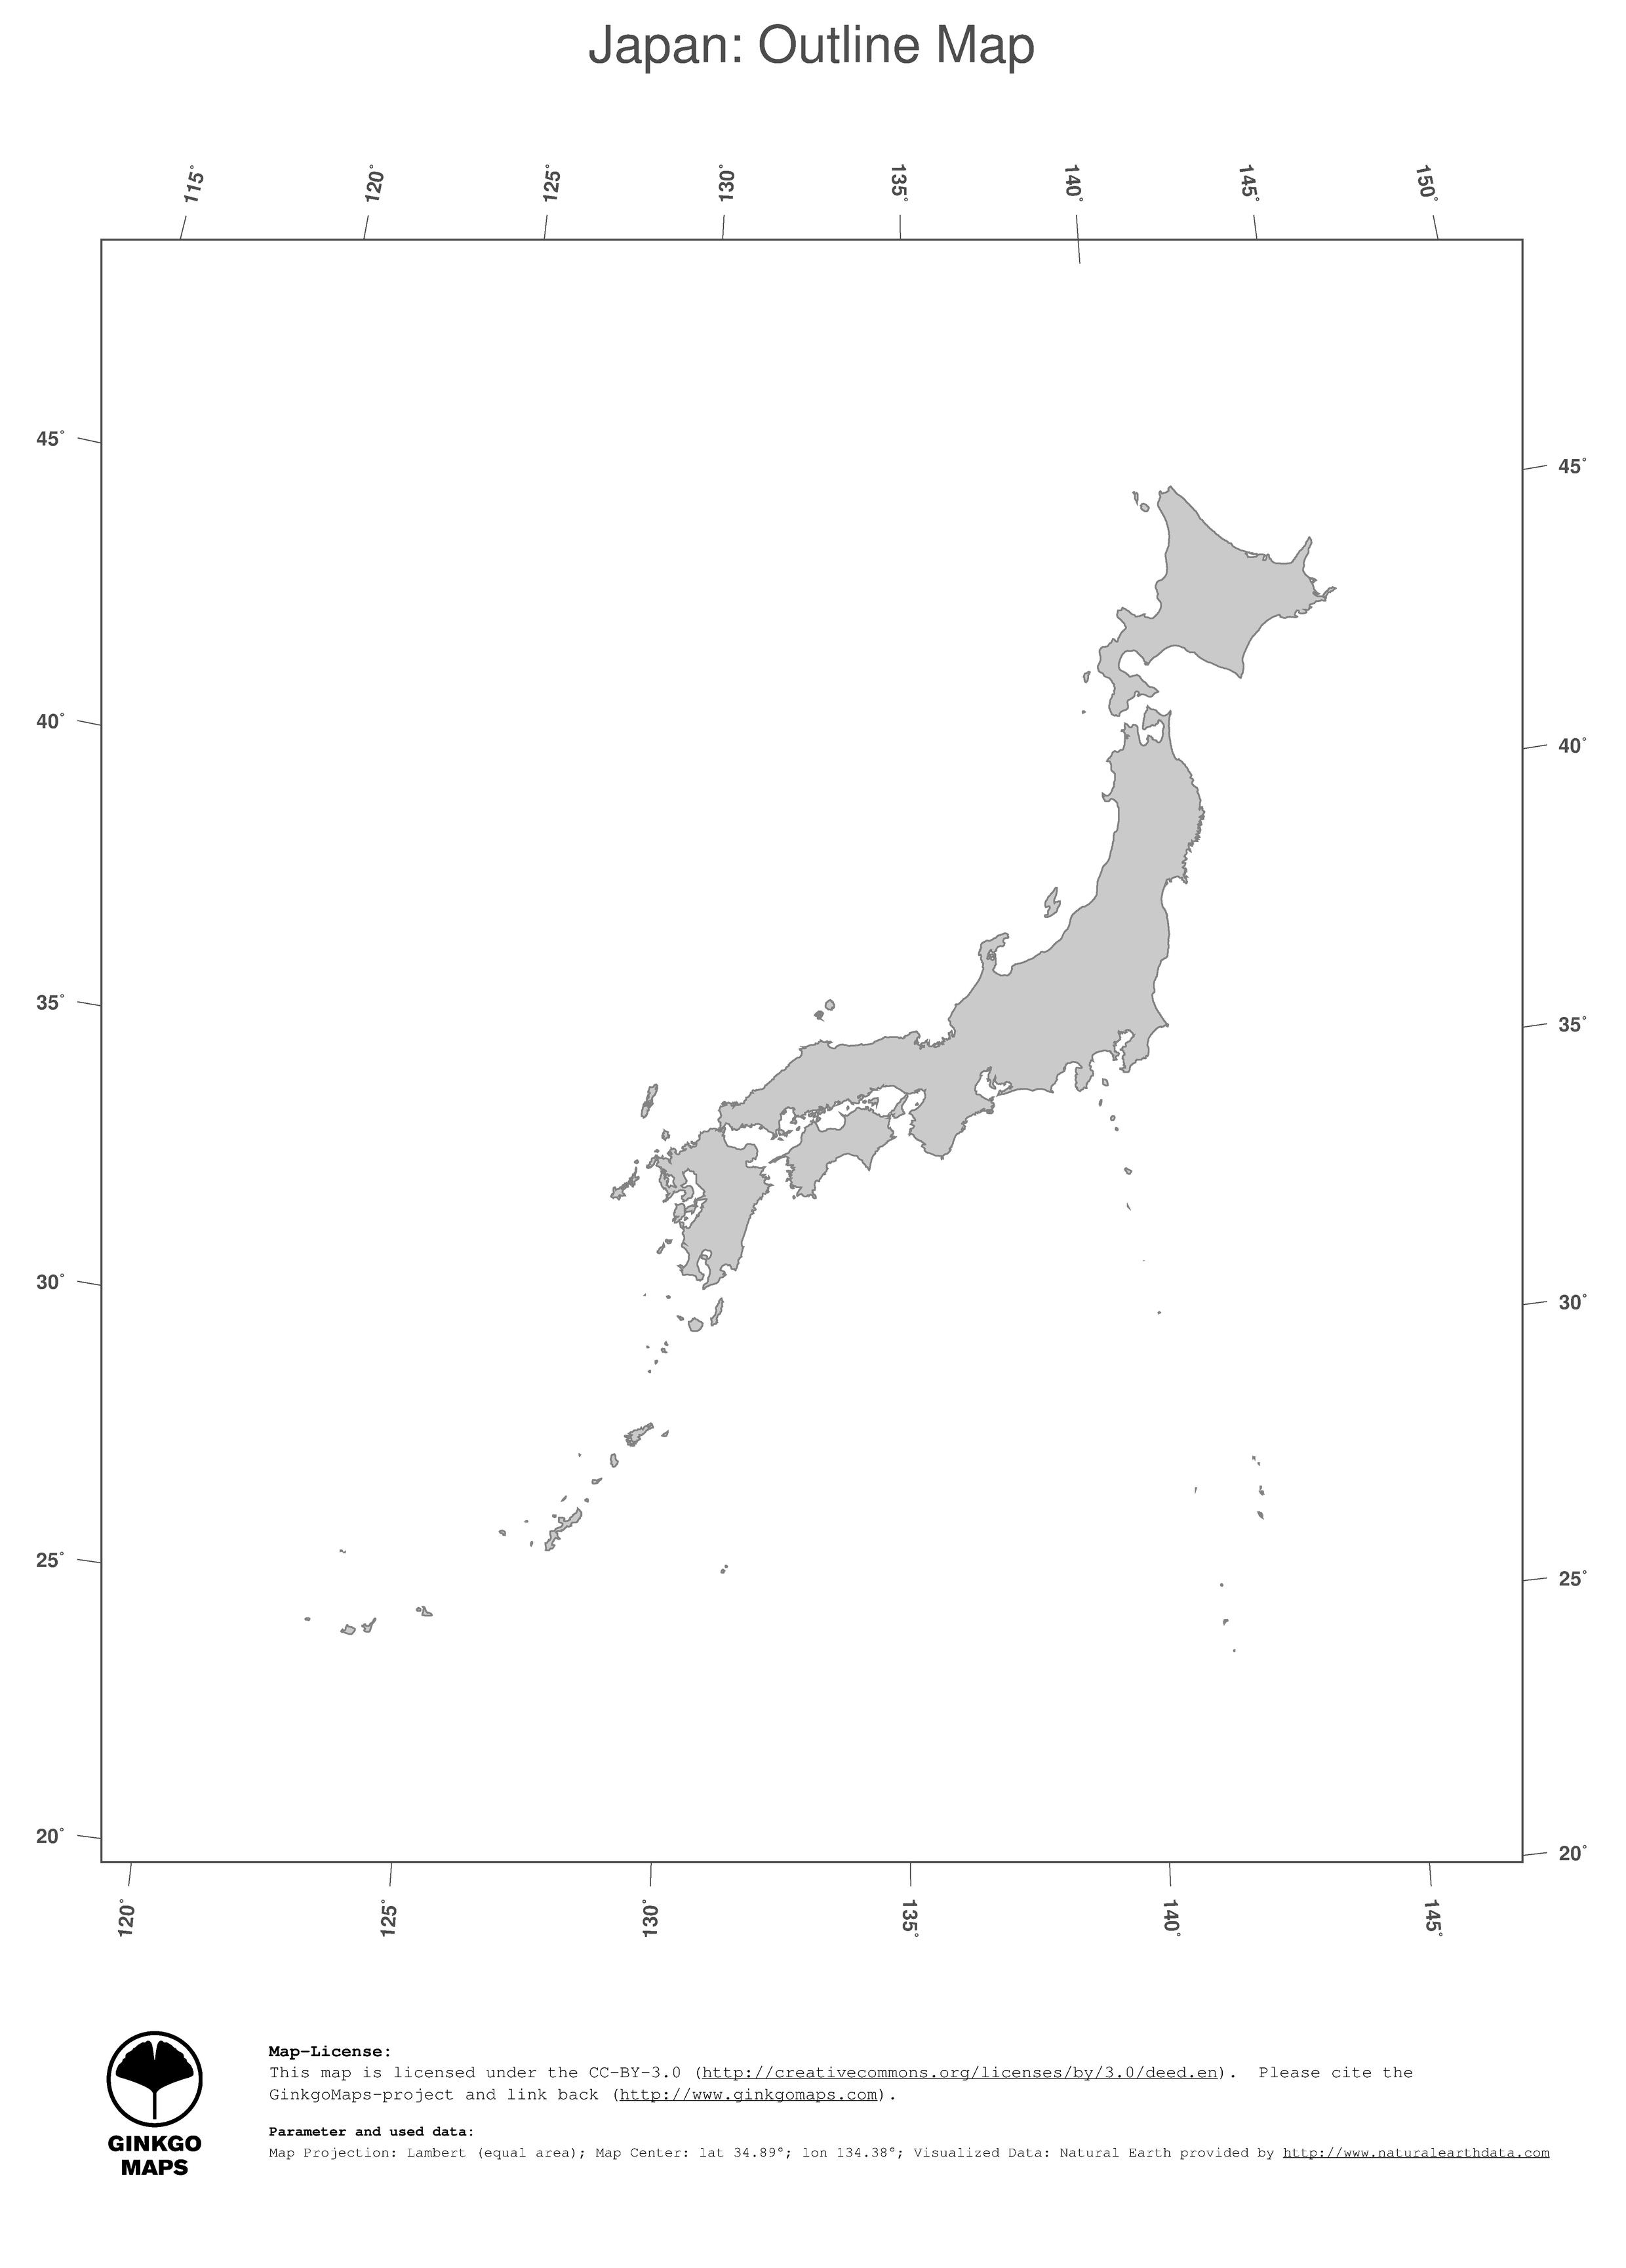 Map Japan GinkgoMaps Continent Asia Region Japan - Japan map outline